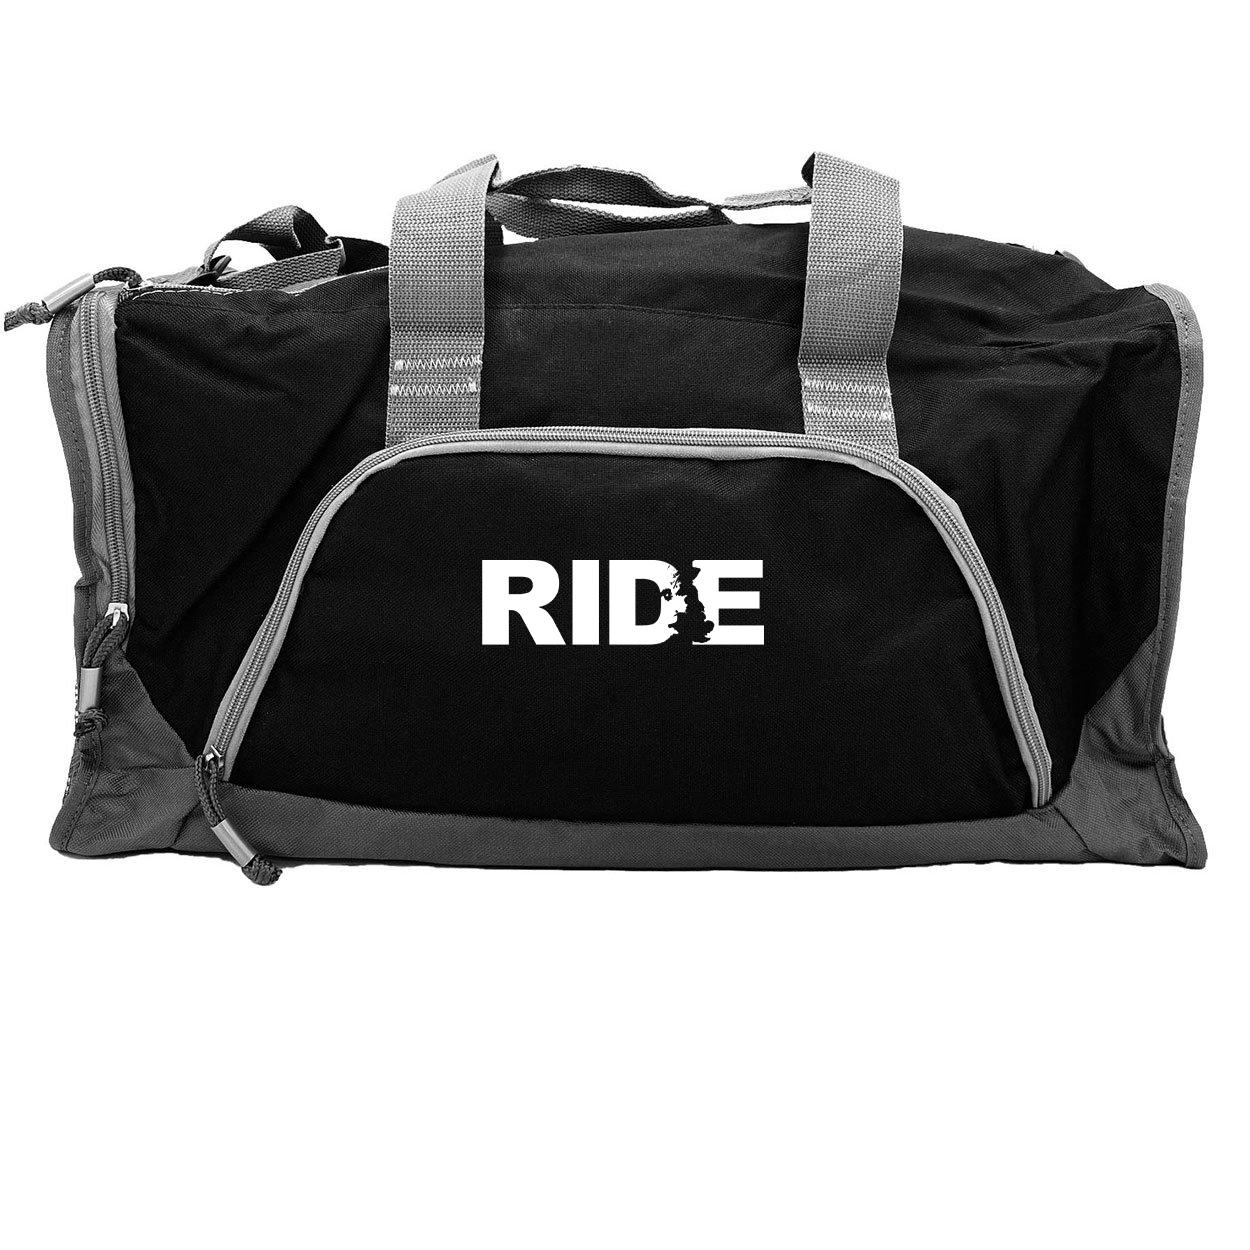 Ride United Kingdom Classic Rangeley Sport Duffel Bag Black (White Logo)